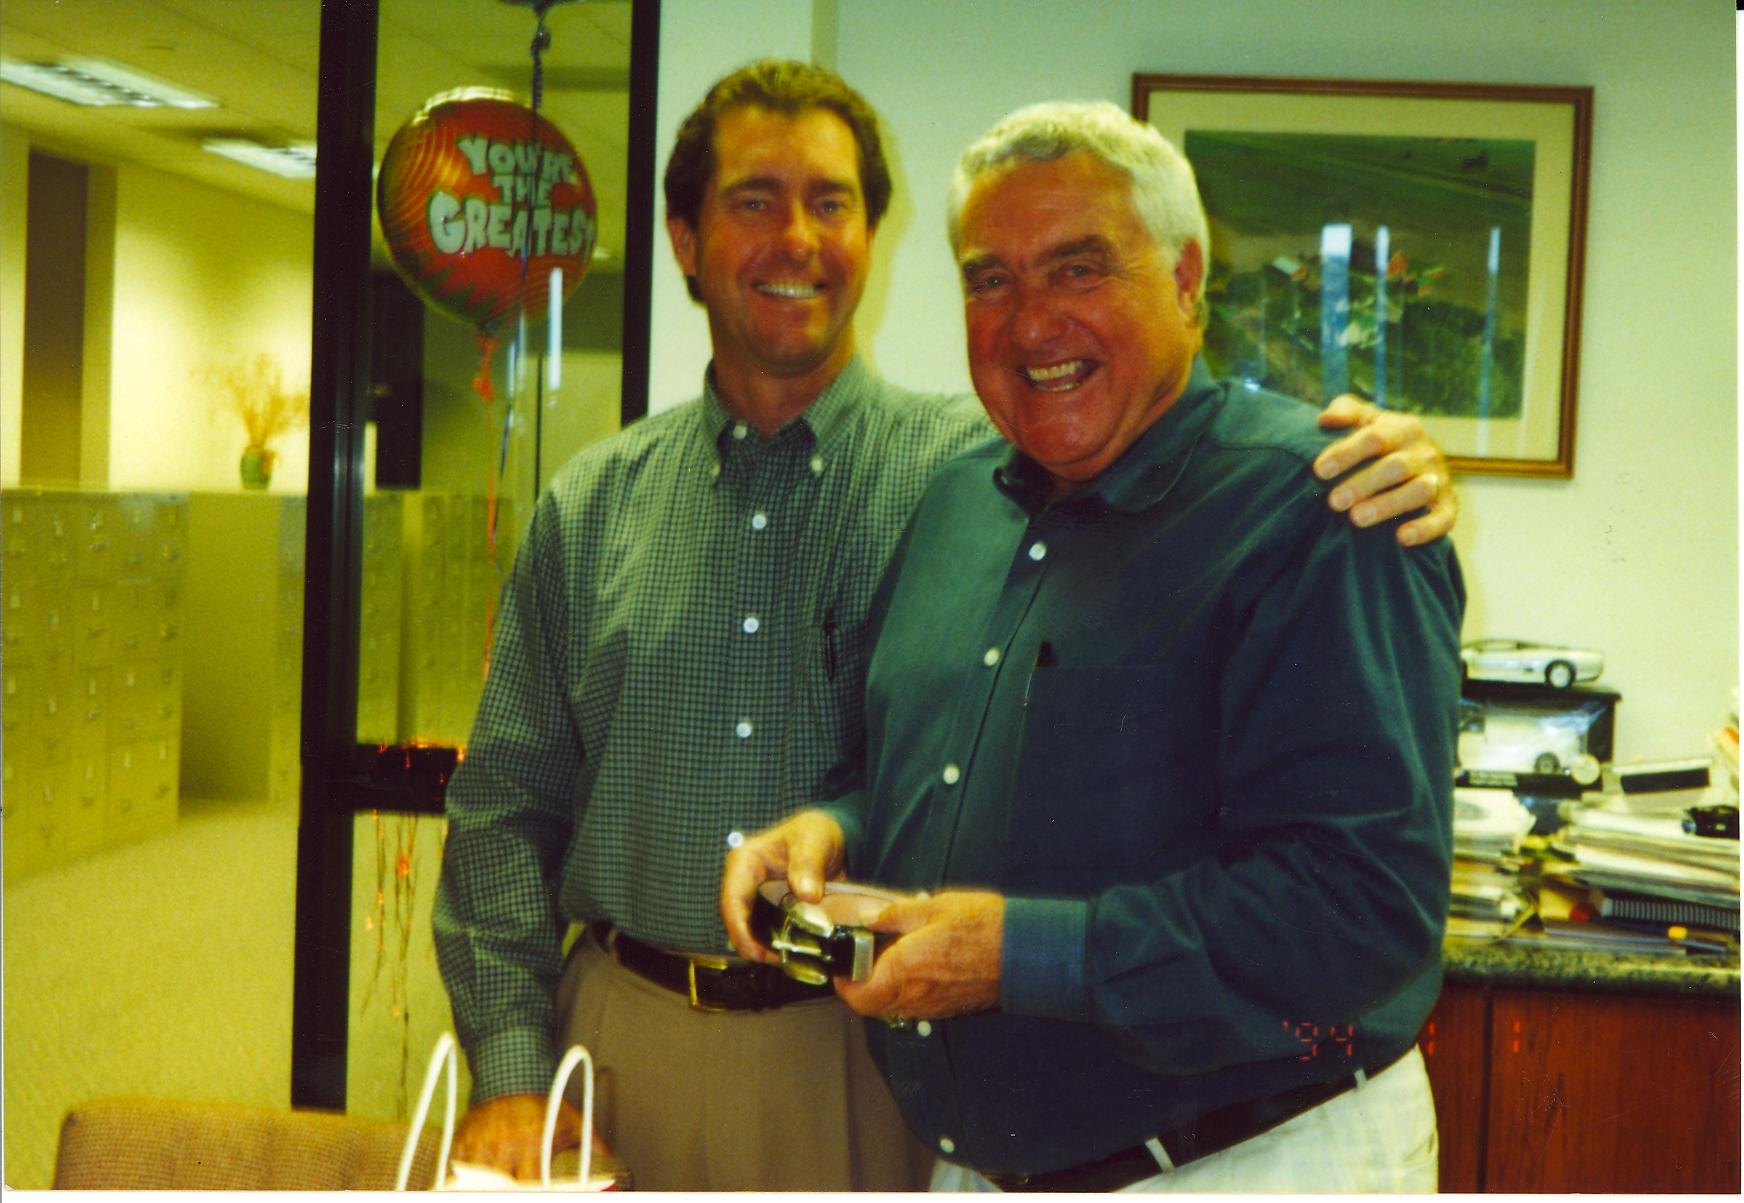 Ed Bobit: A Man of Outsized Pleasures